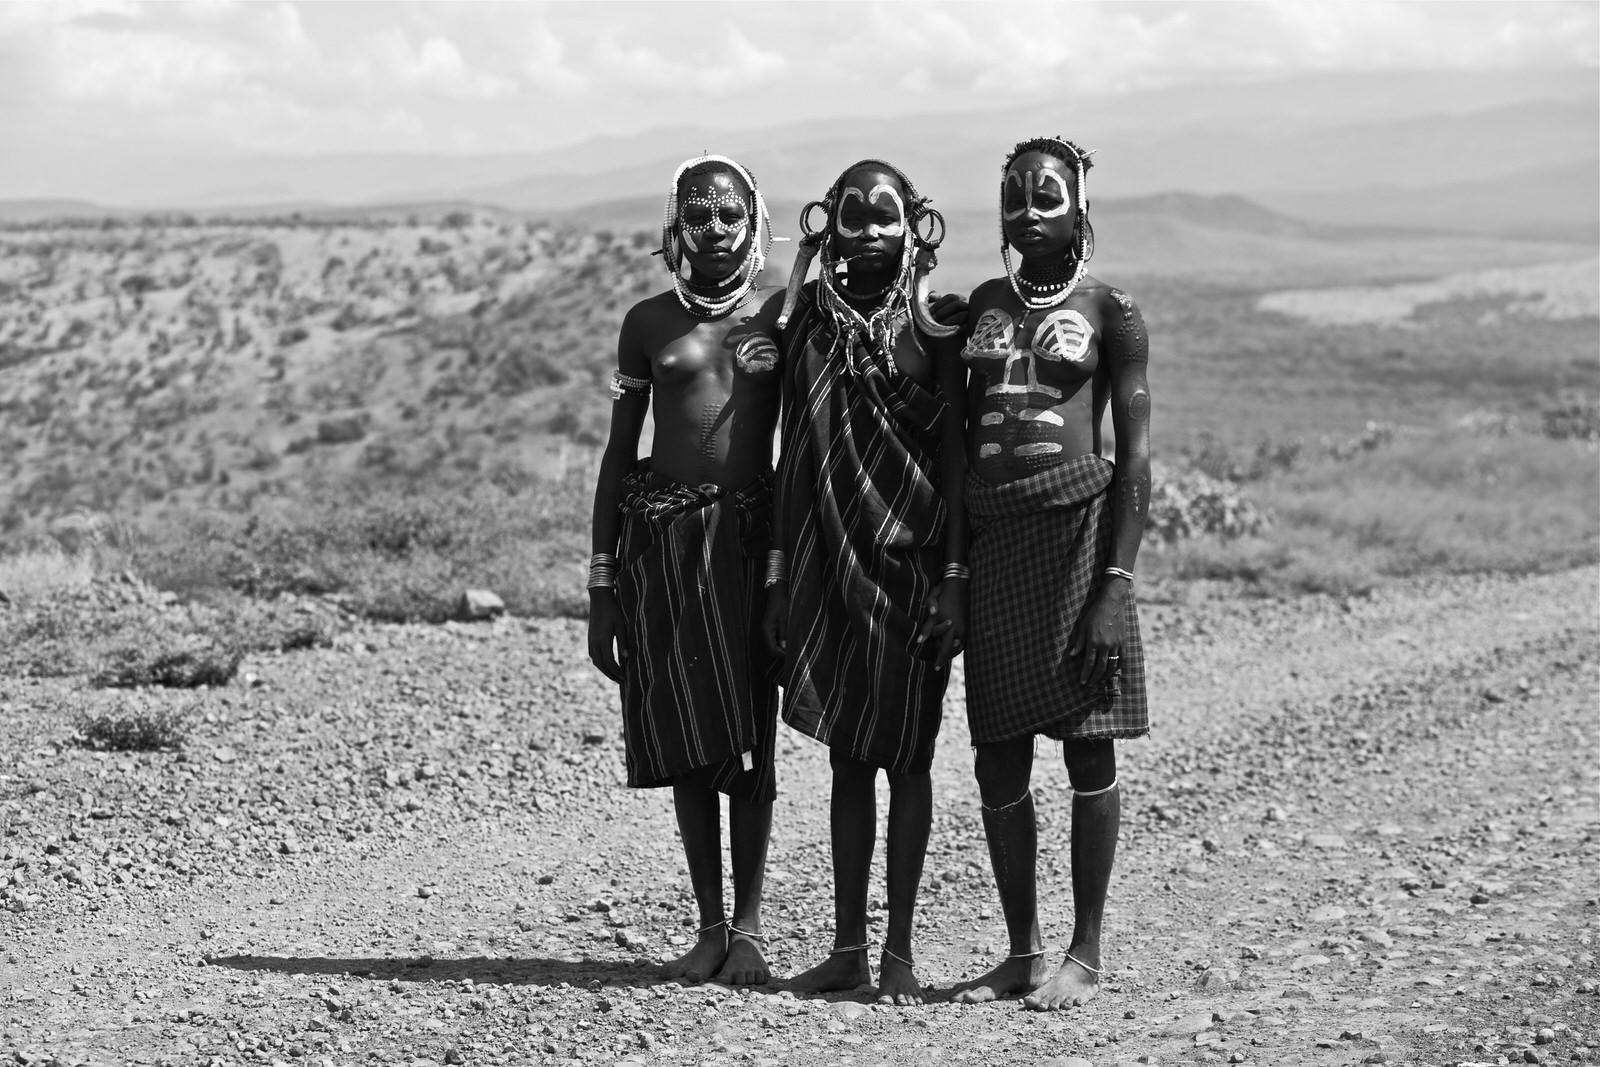 Ono Valley, Ethiopia